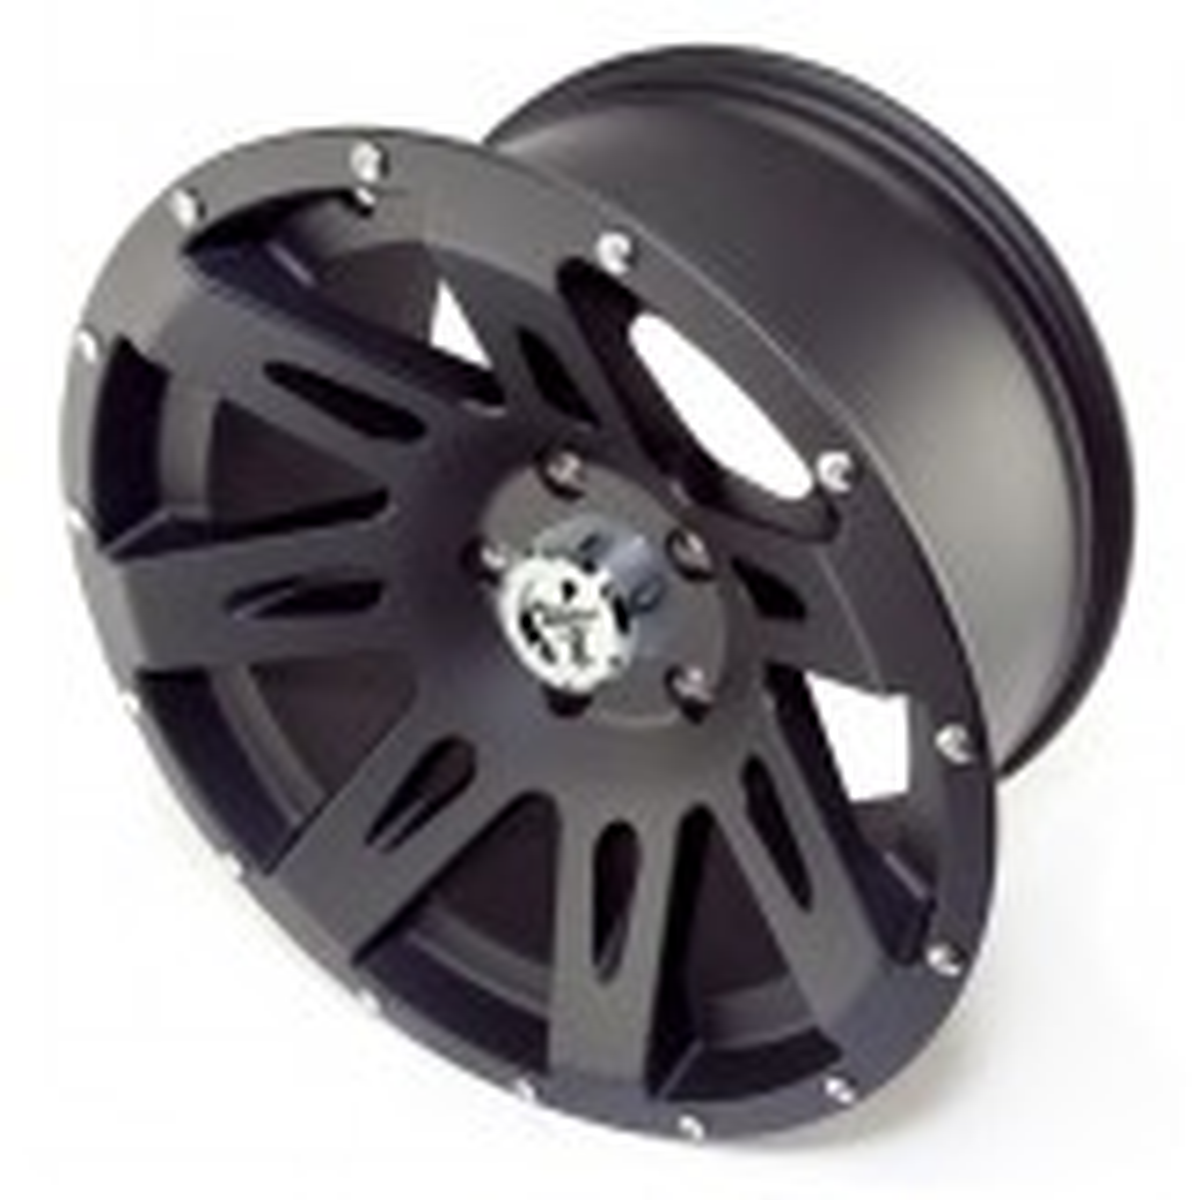 XHD Wheel, 17x9, Black Satin; 07-17 Jeep Wrangler JK